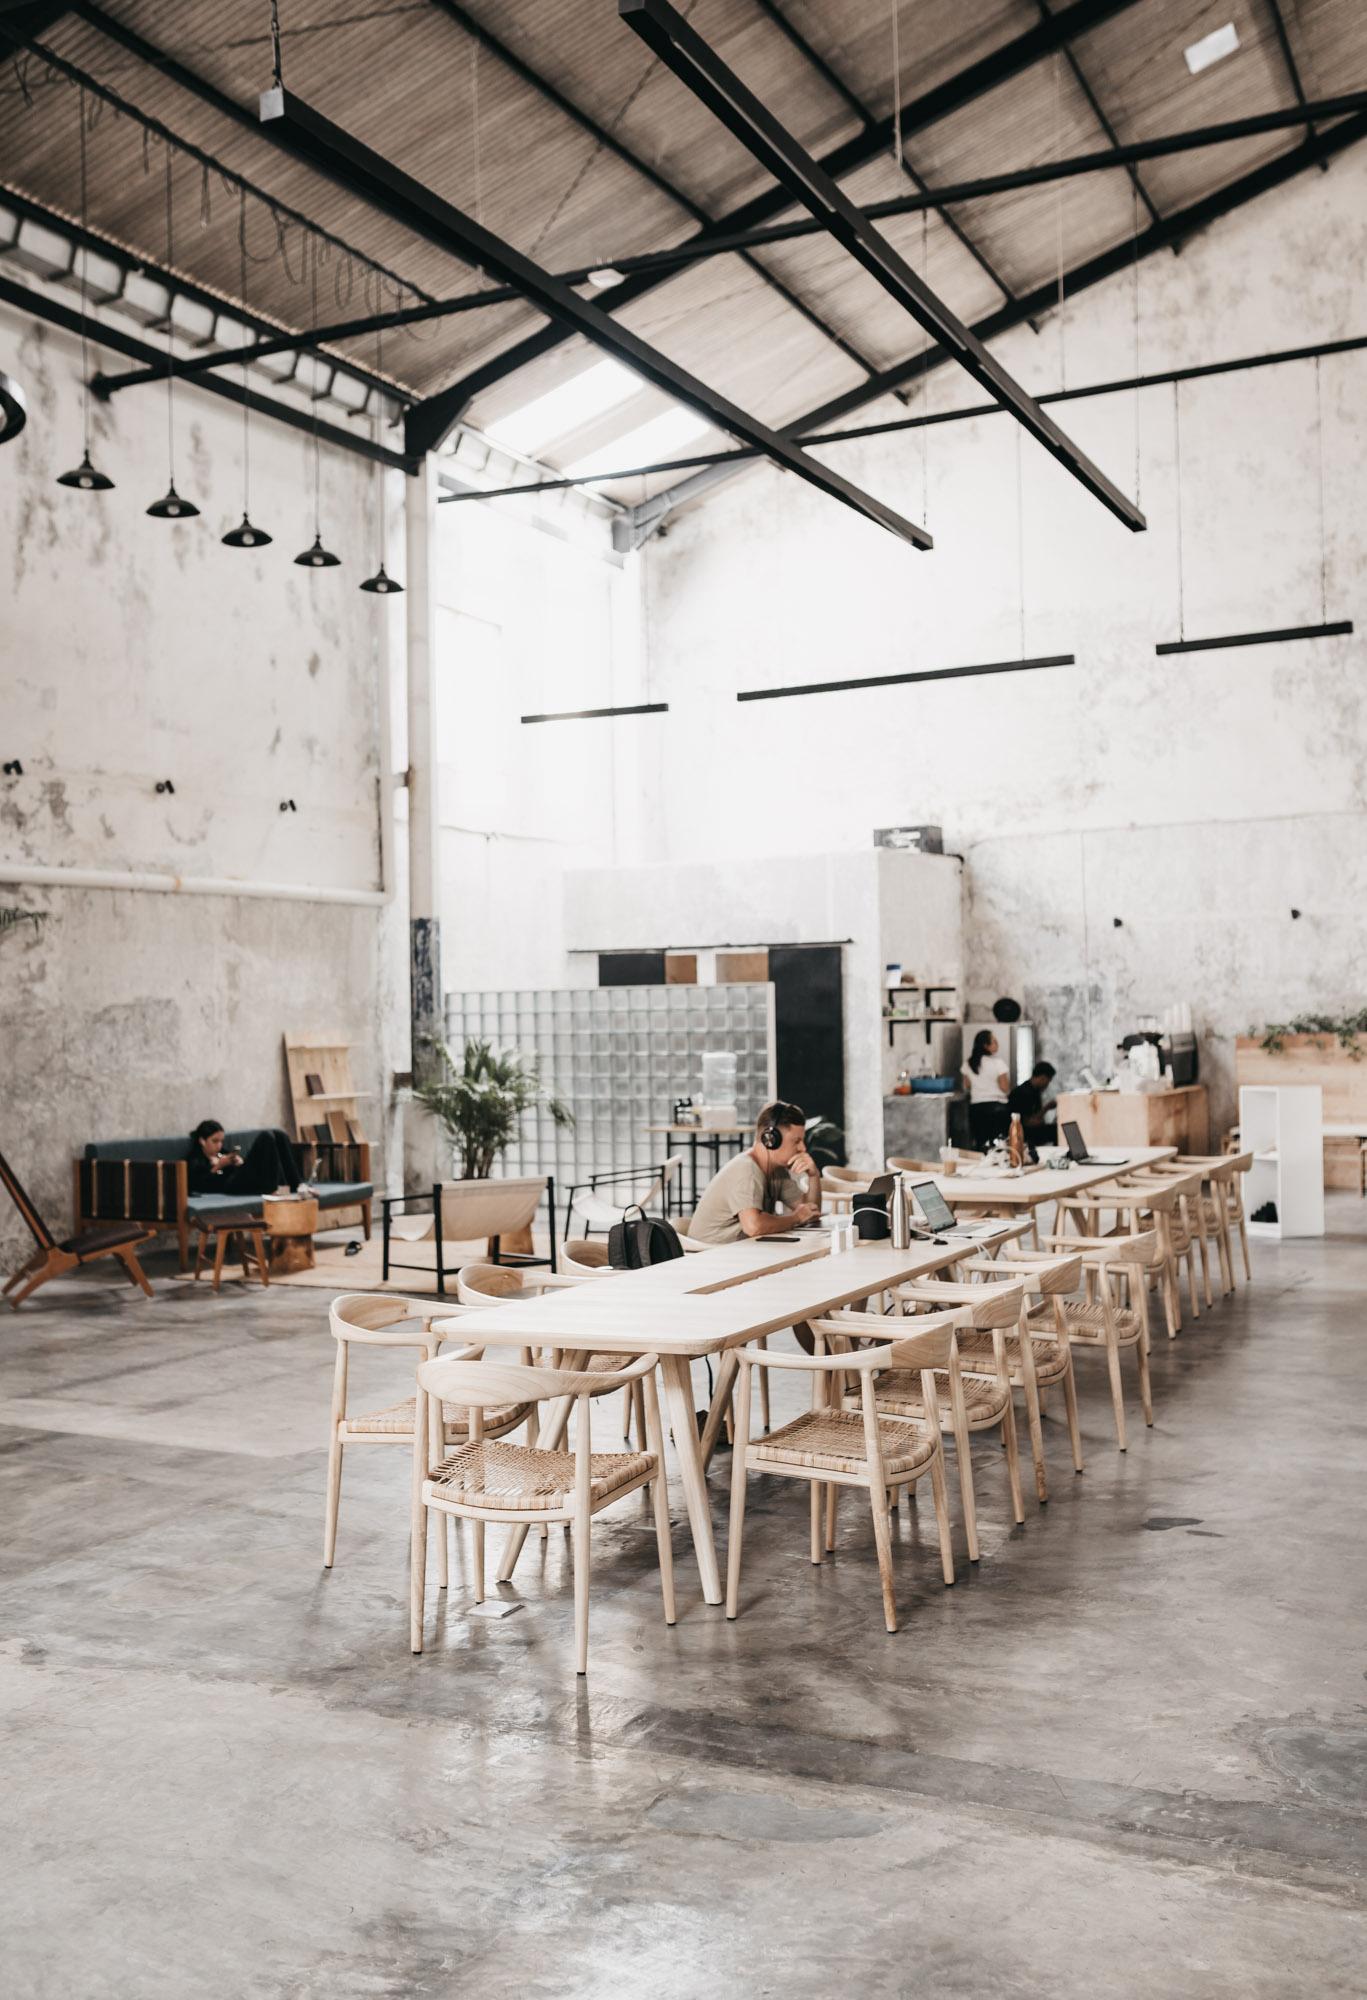 keira-mason-kinship-studio-work-space.jpg